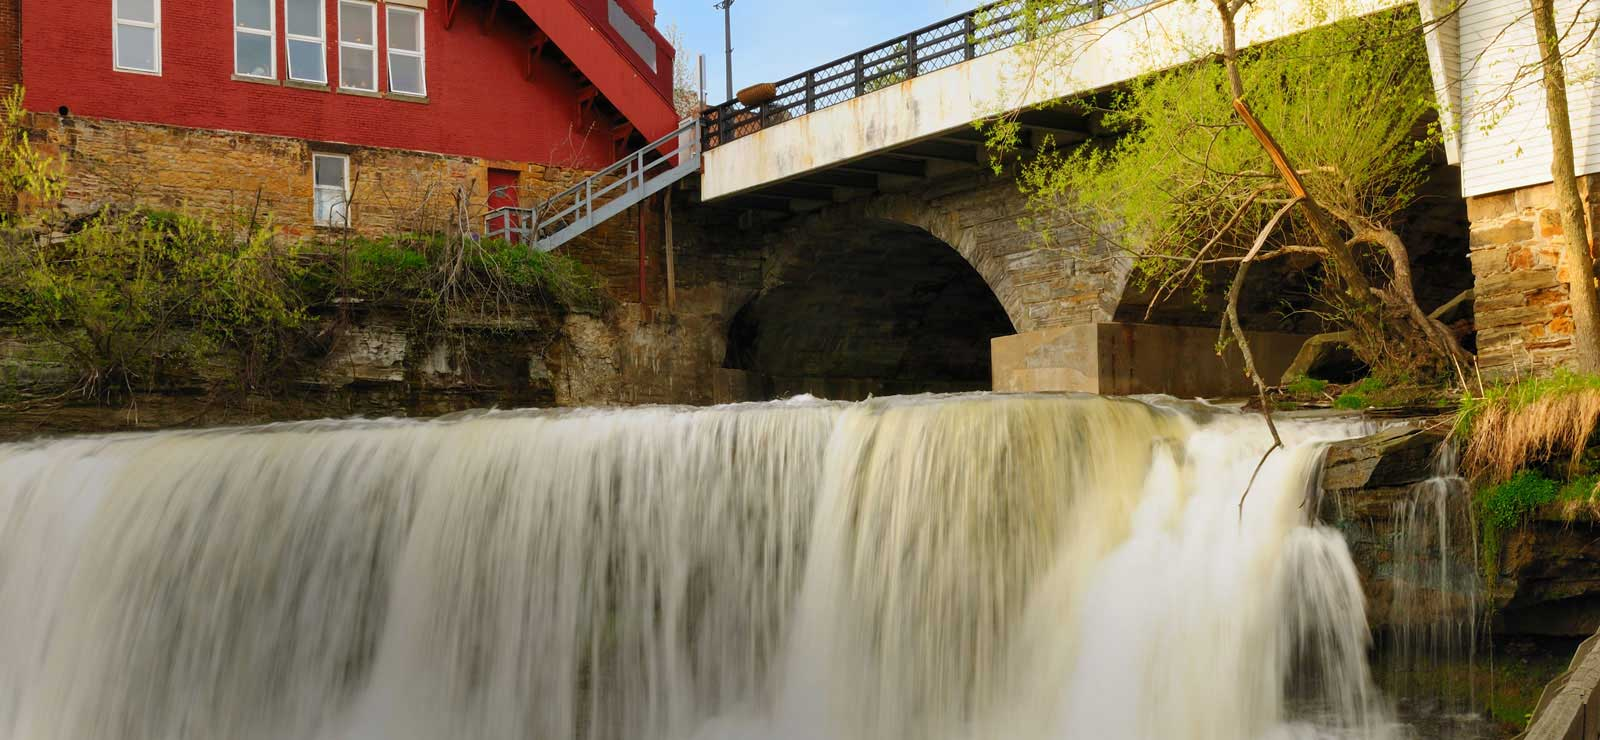 Chagrin Falls in Chagrin Falls, Ohio